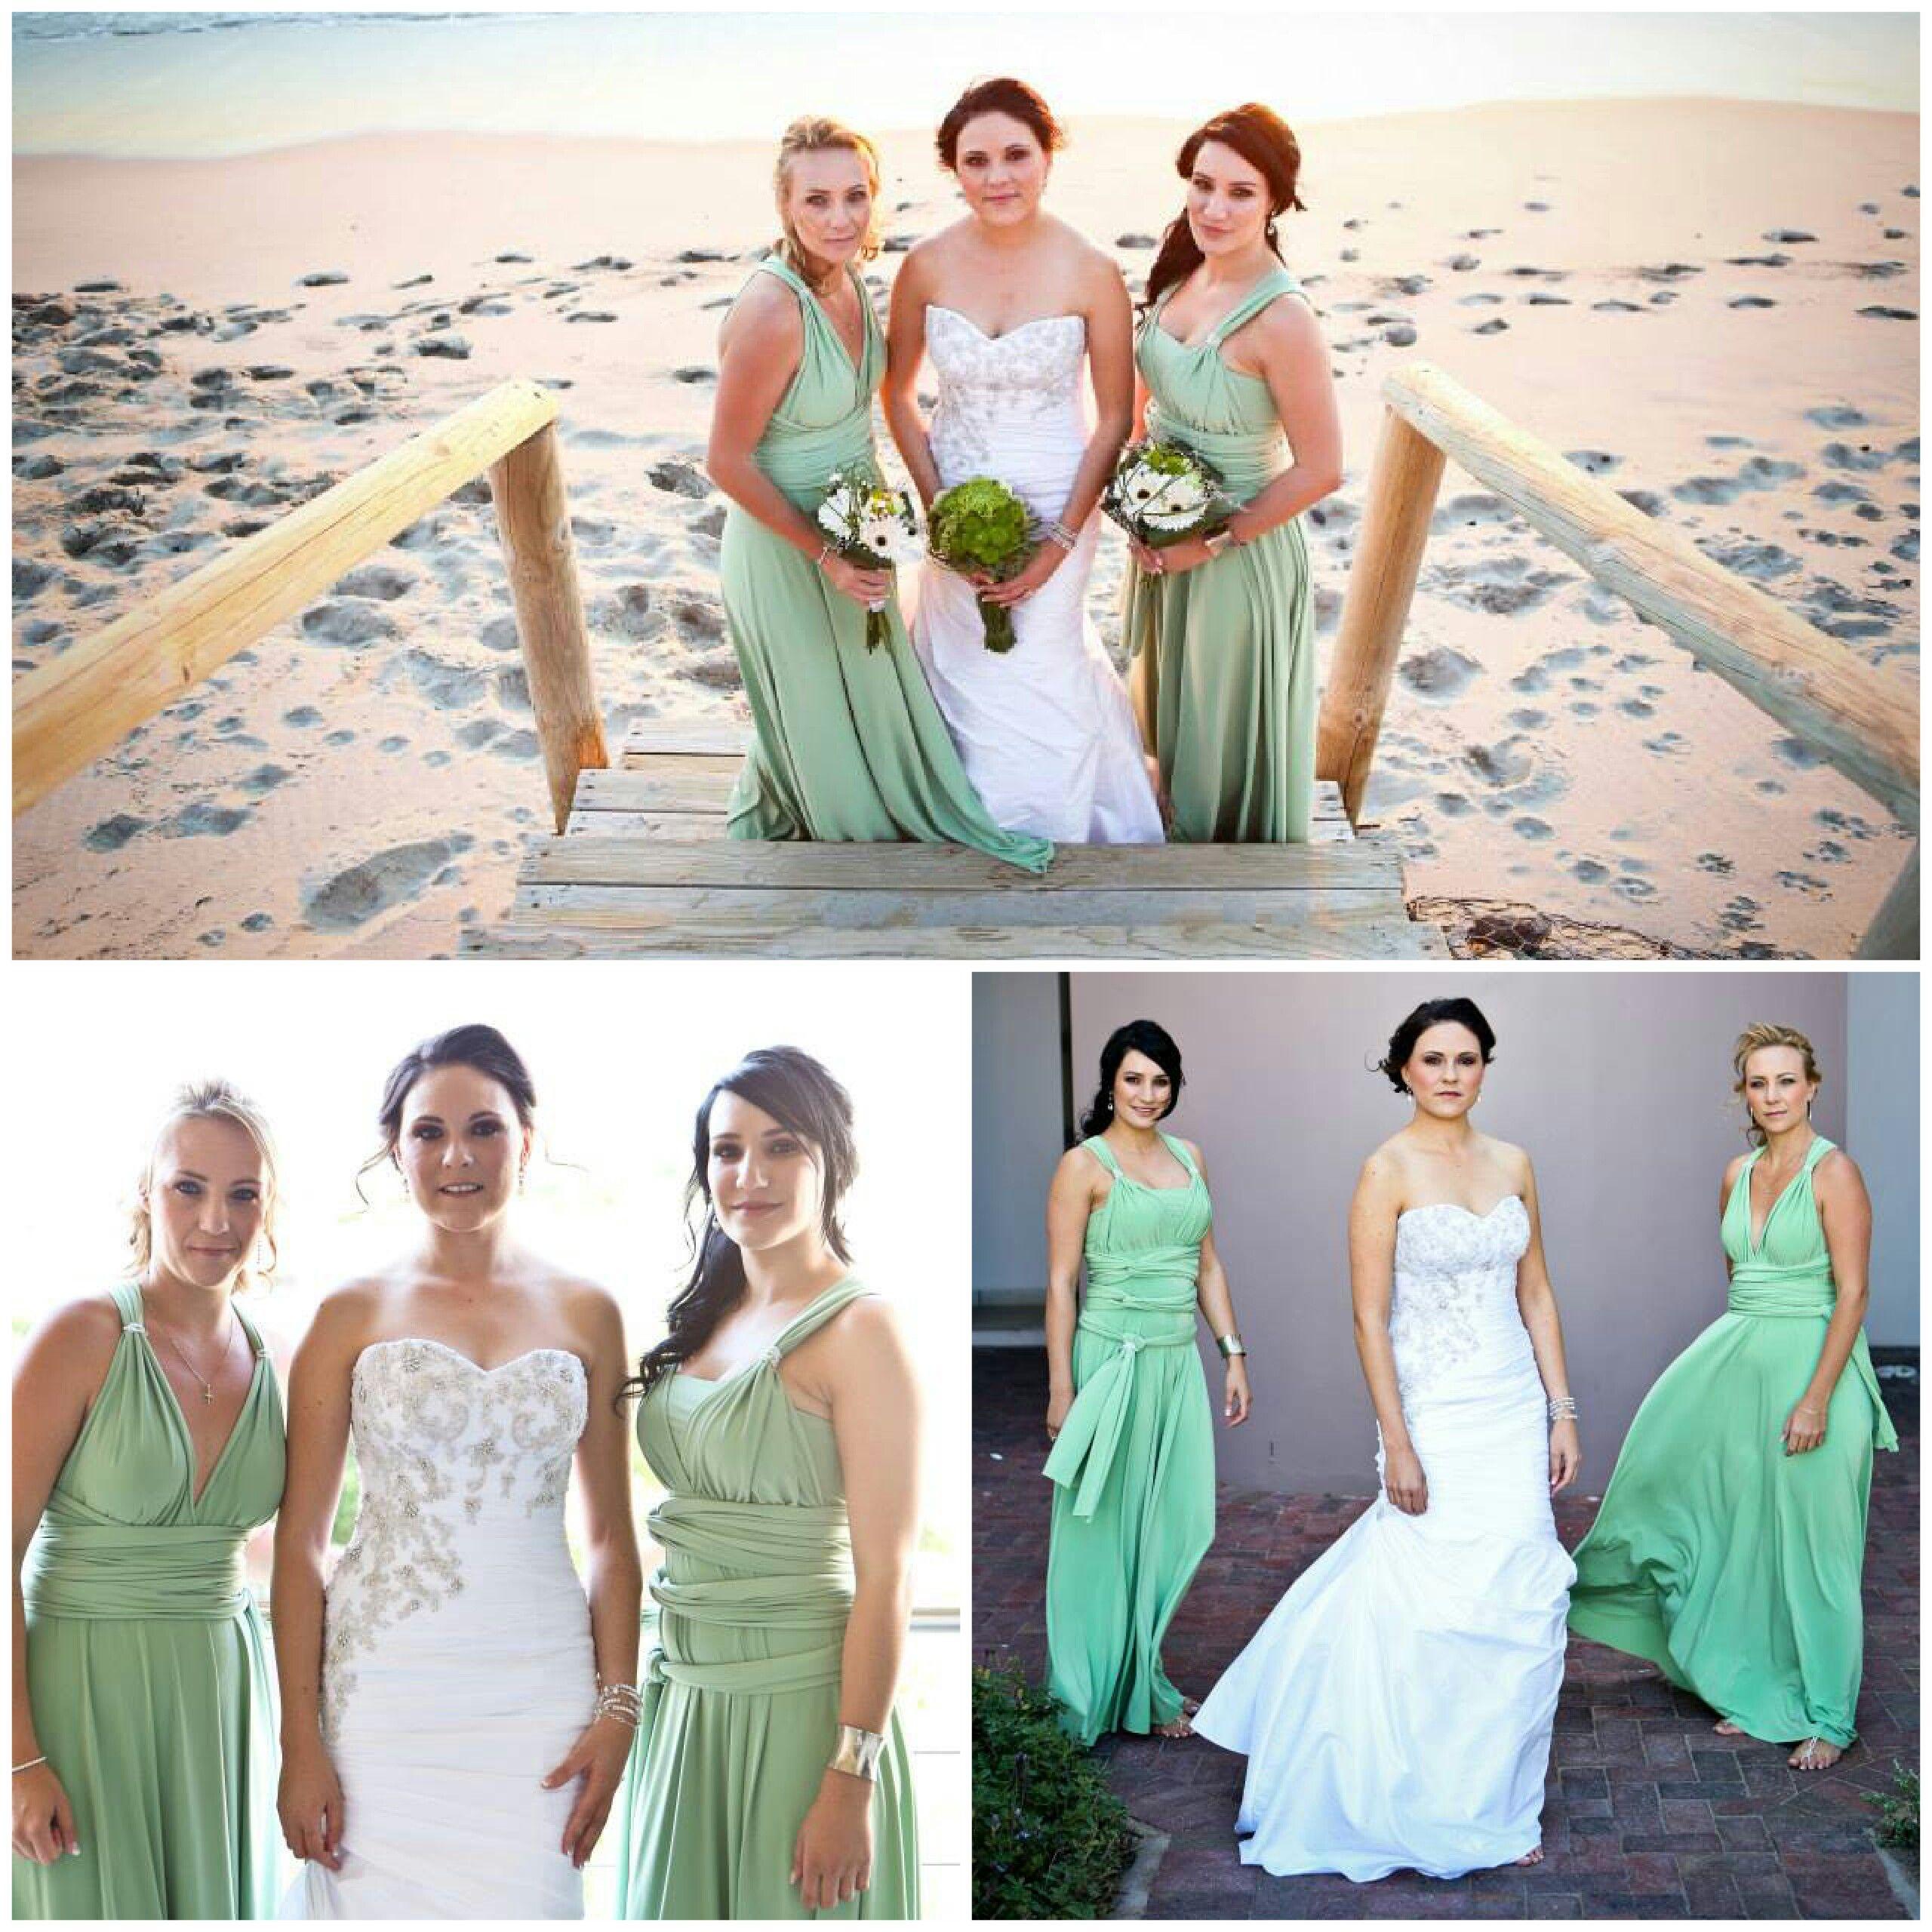 Bridesmaid dresses by gelique pretty in peppermint httpswww bridesmaid dresses by gelique pretty in peppermint httpsfacebook ombrellifo Images